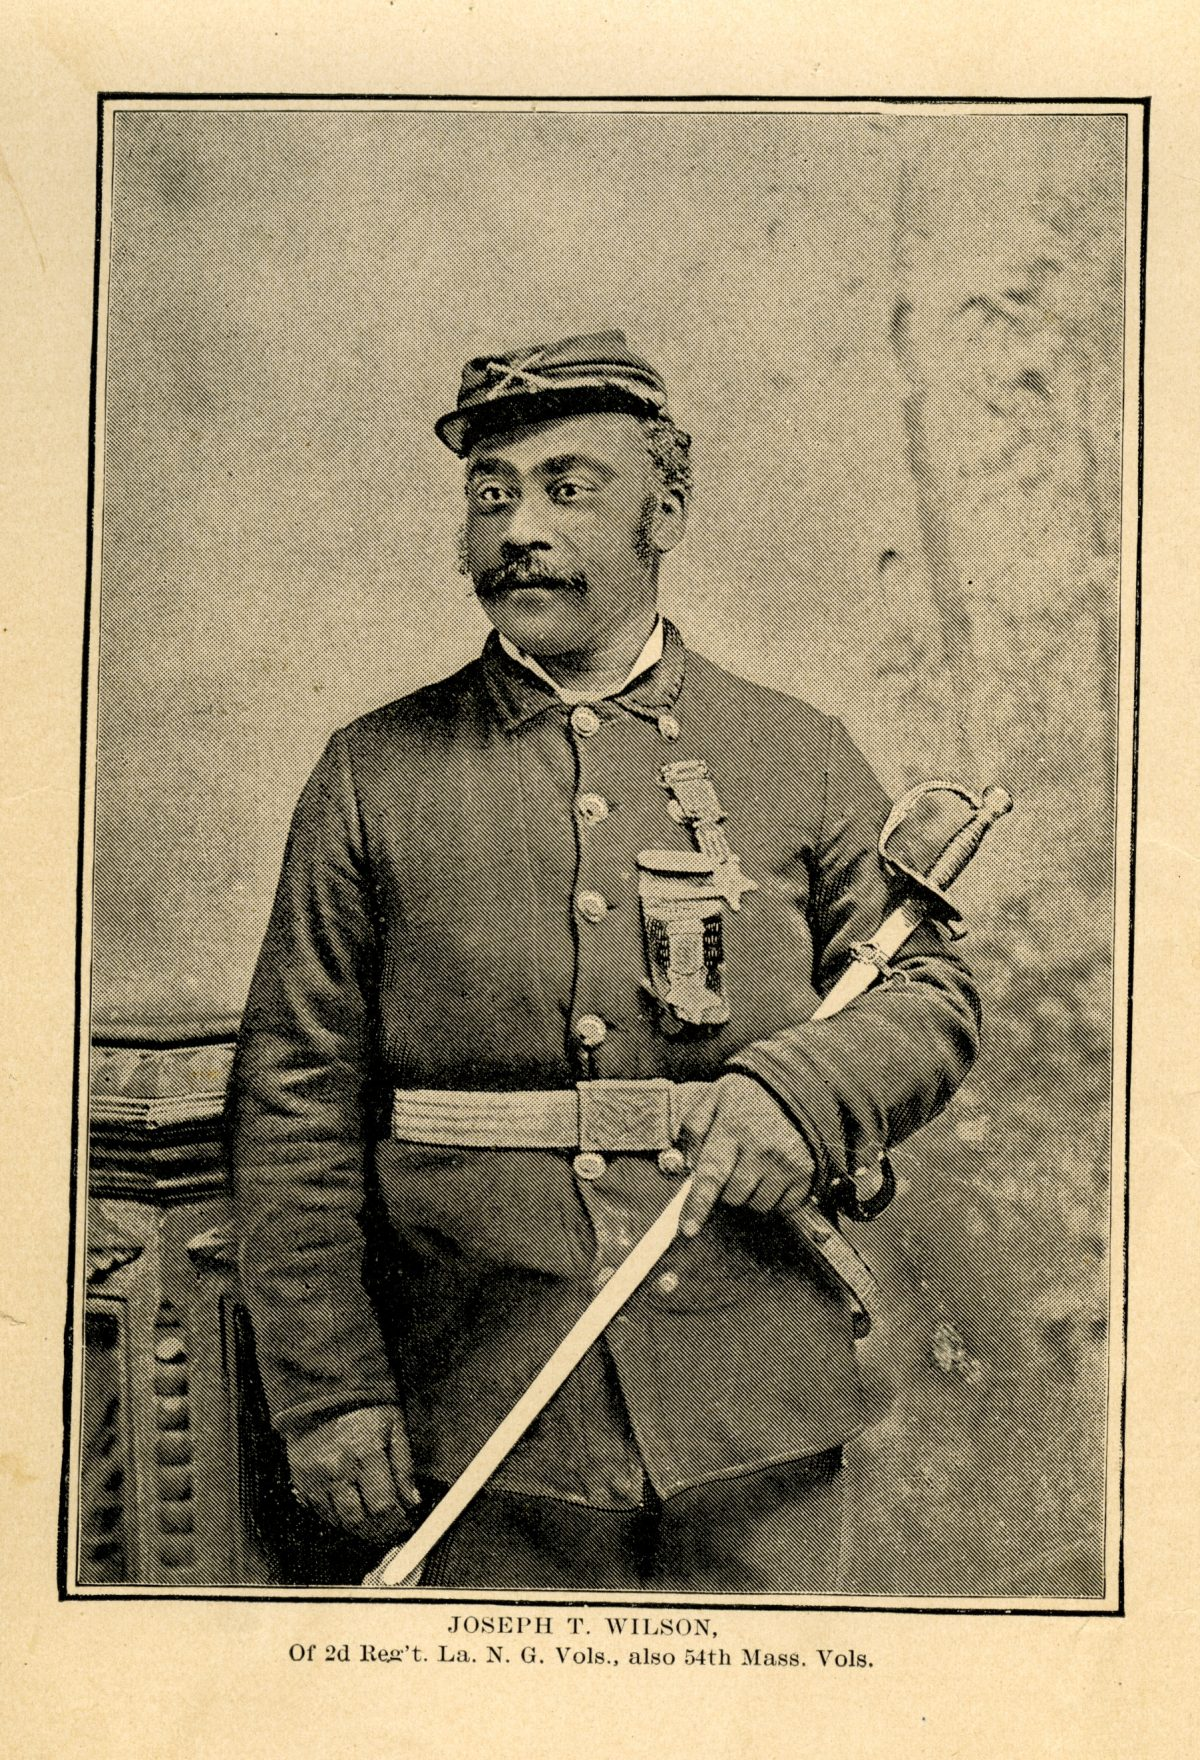 Joseph T. Wilson